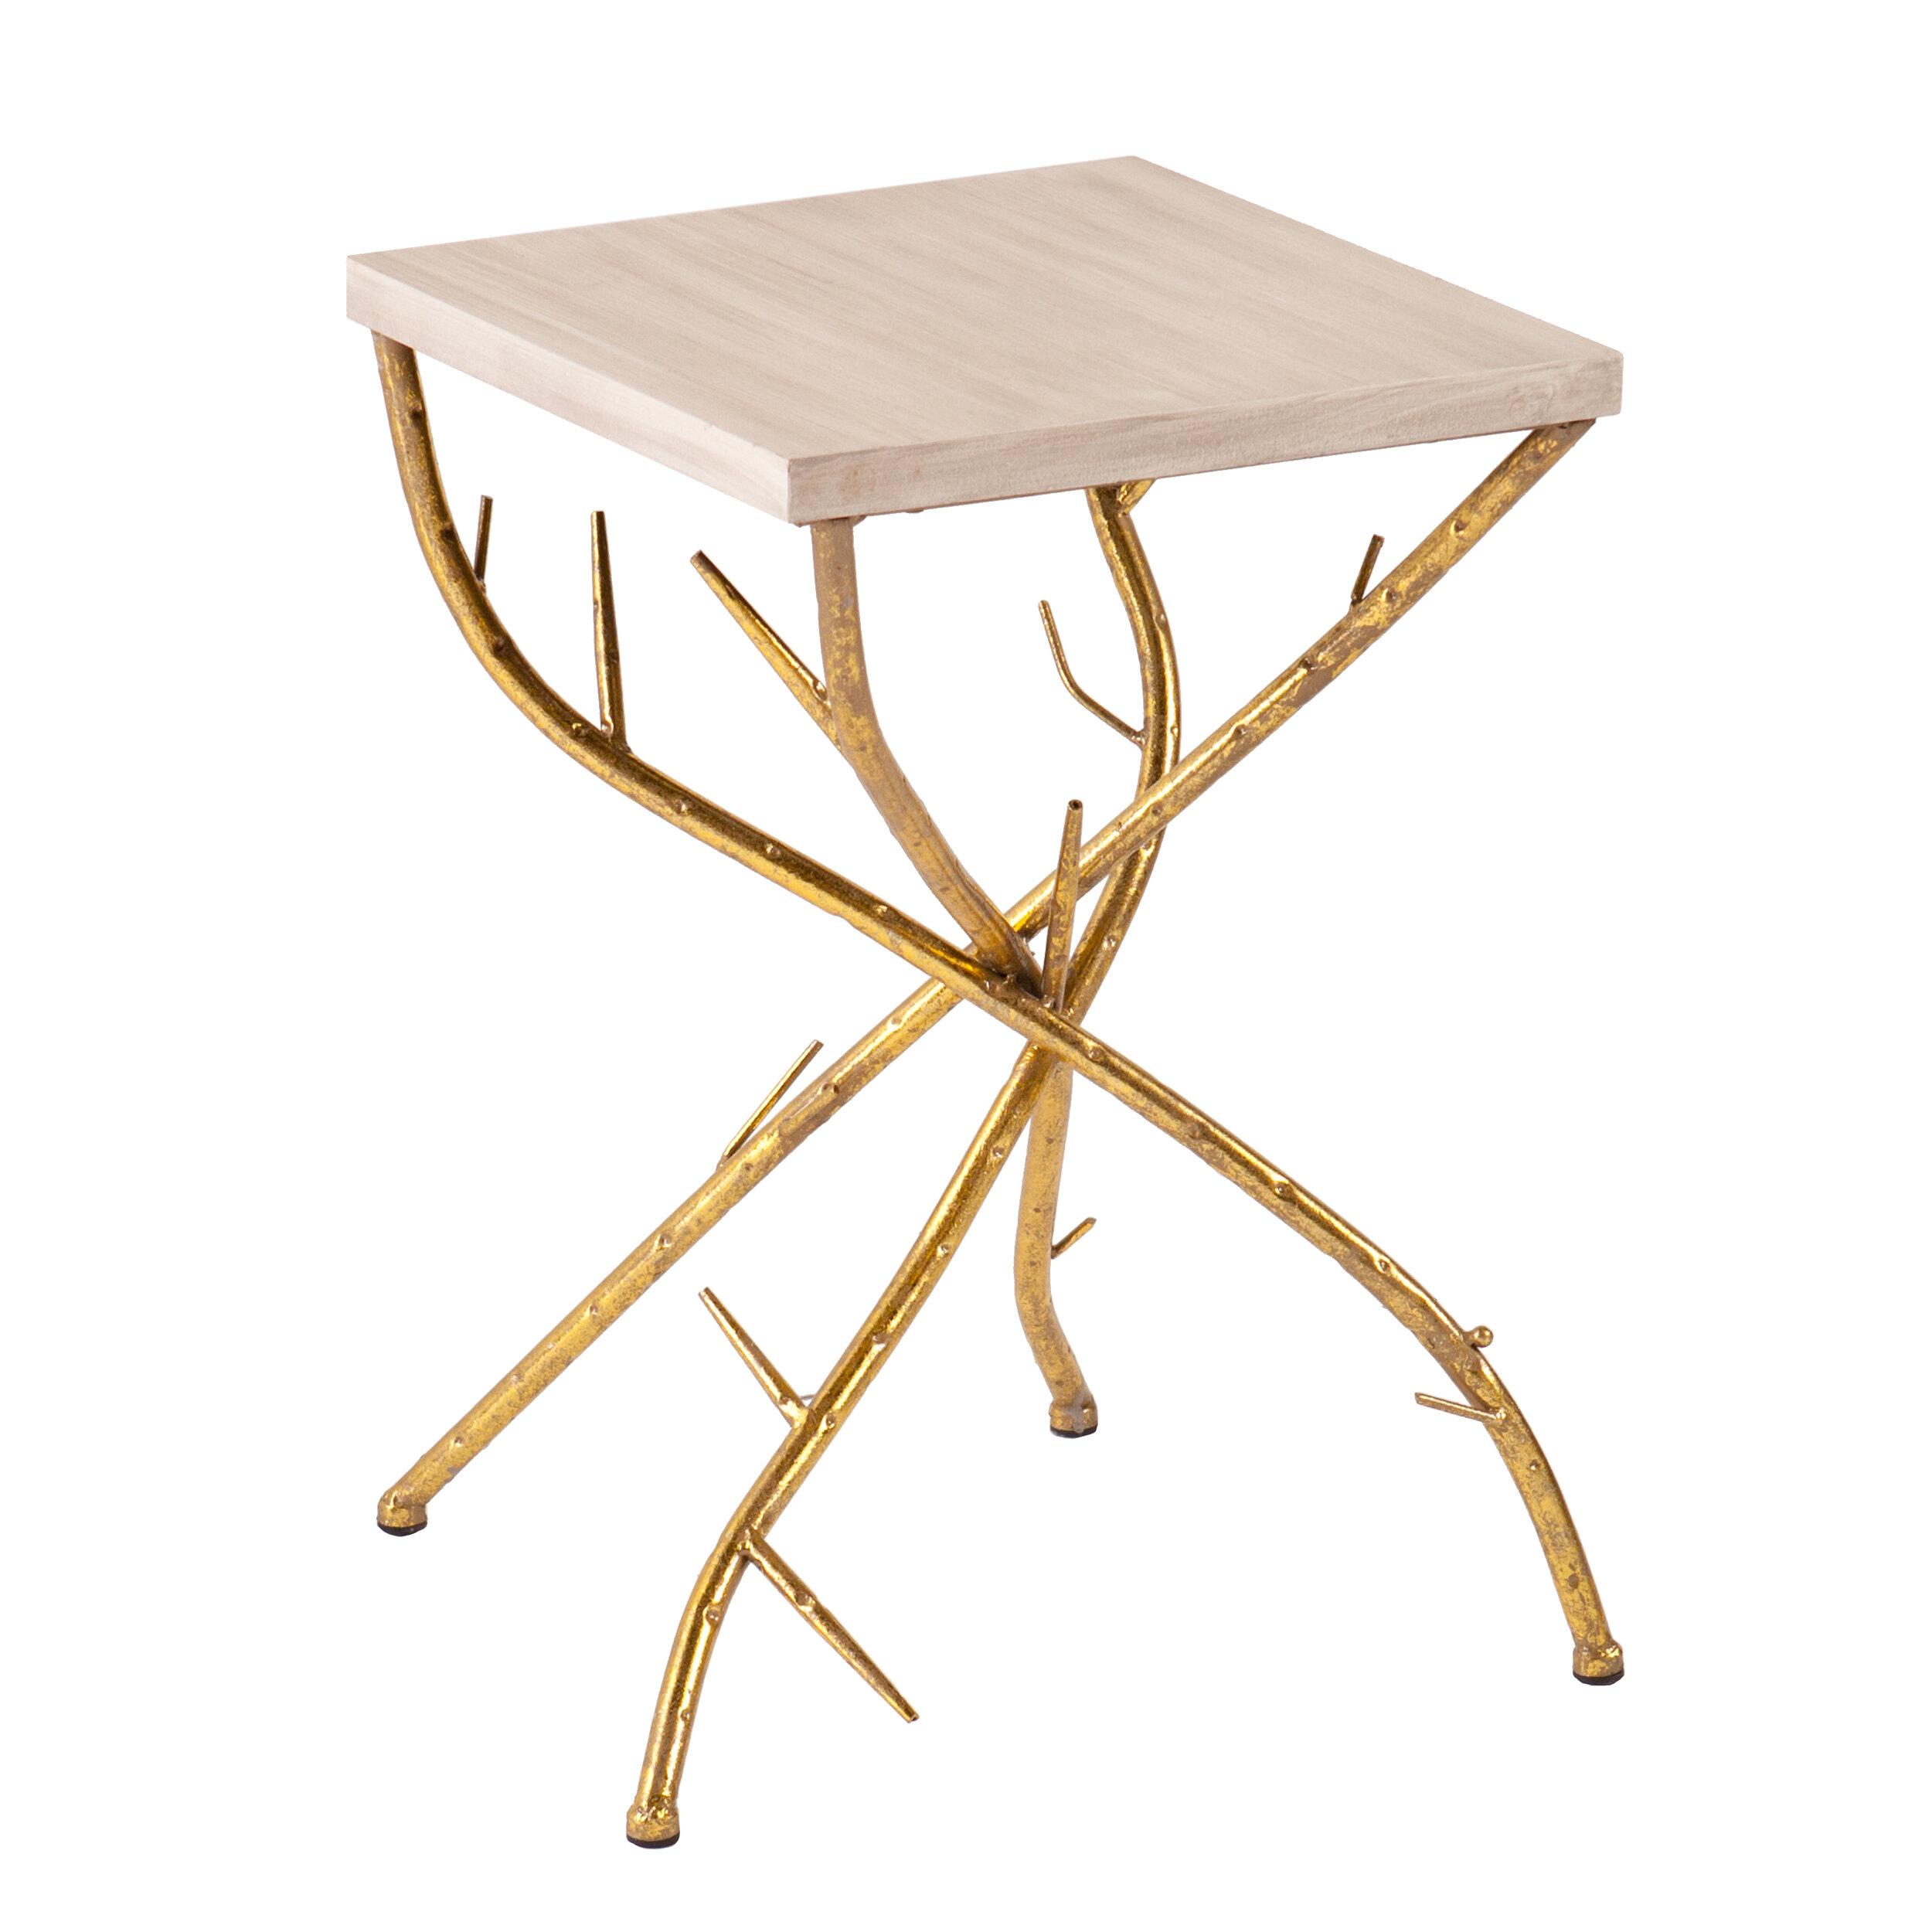 Home U0026 Haus Nymeria Branch Side Table U0026 Reviews   Wayfair.co.uk